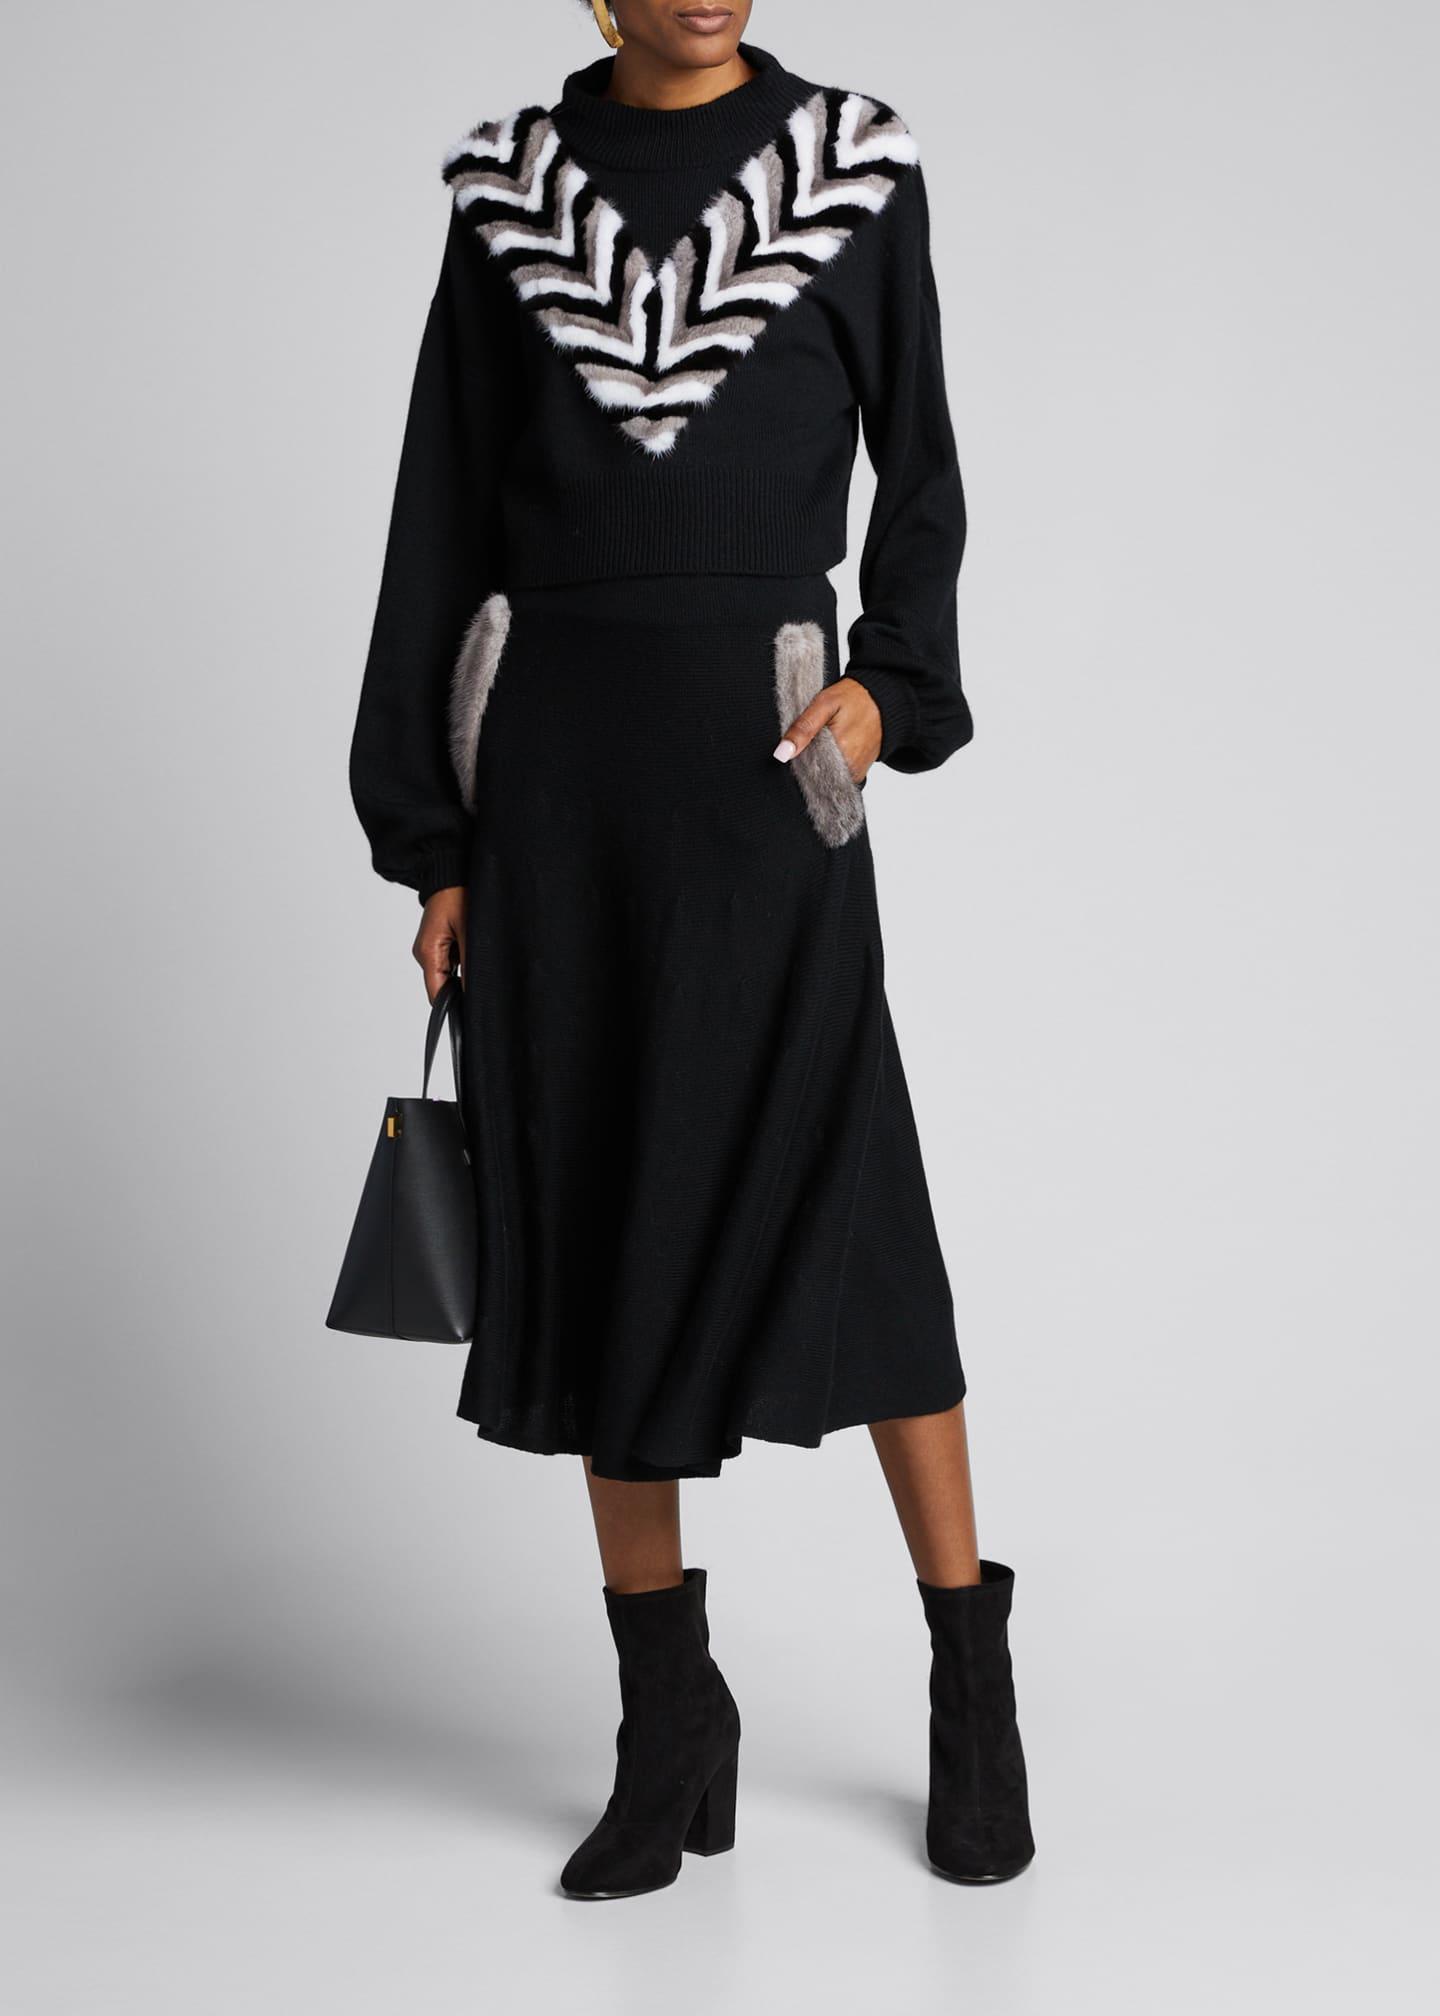 IZAAK AZANEI Wool-Cashmere Pullover Sweater with Mink Trim